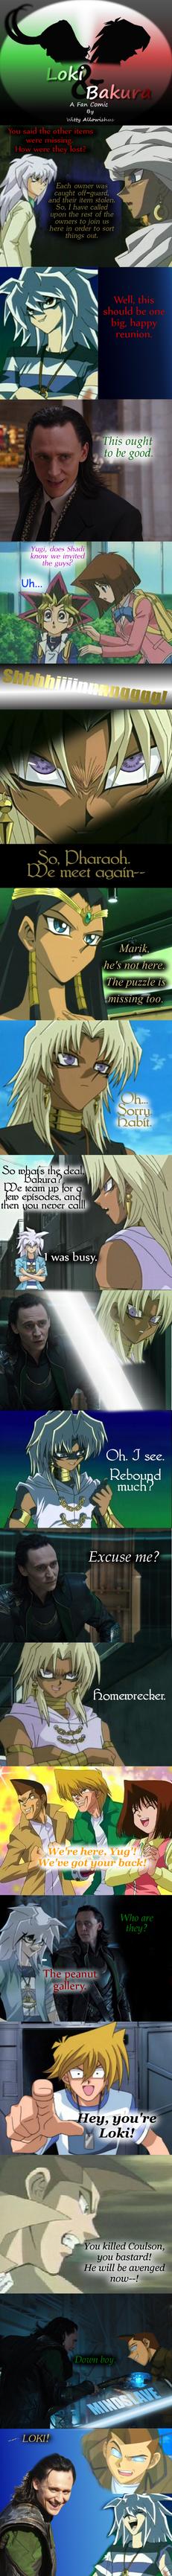 Loki and Bakura XXIV - Villain Rebound by Witty-Allowishus